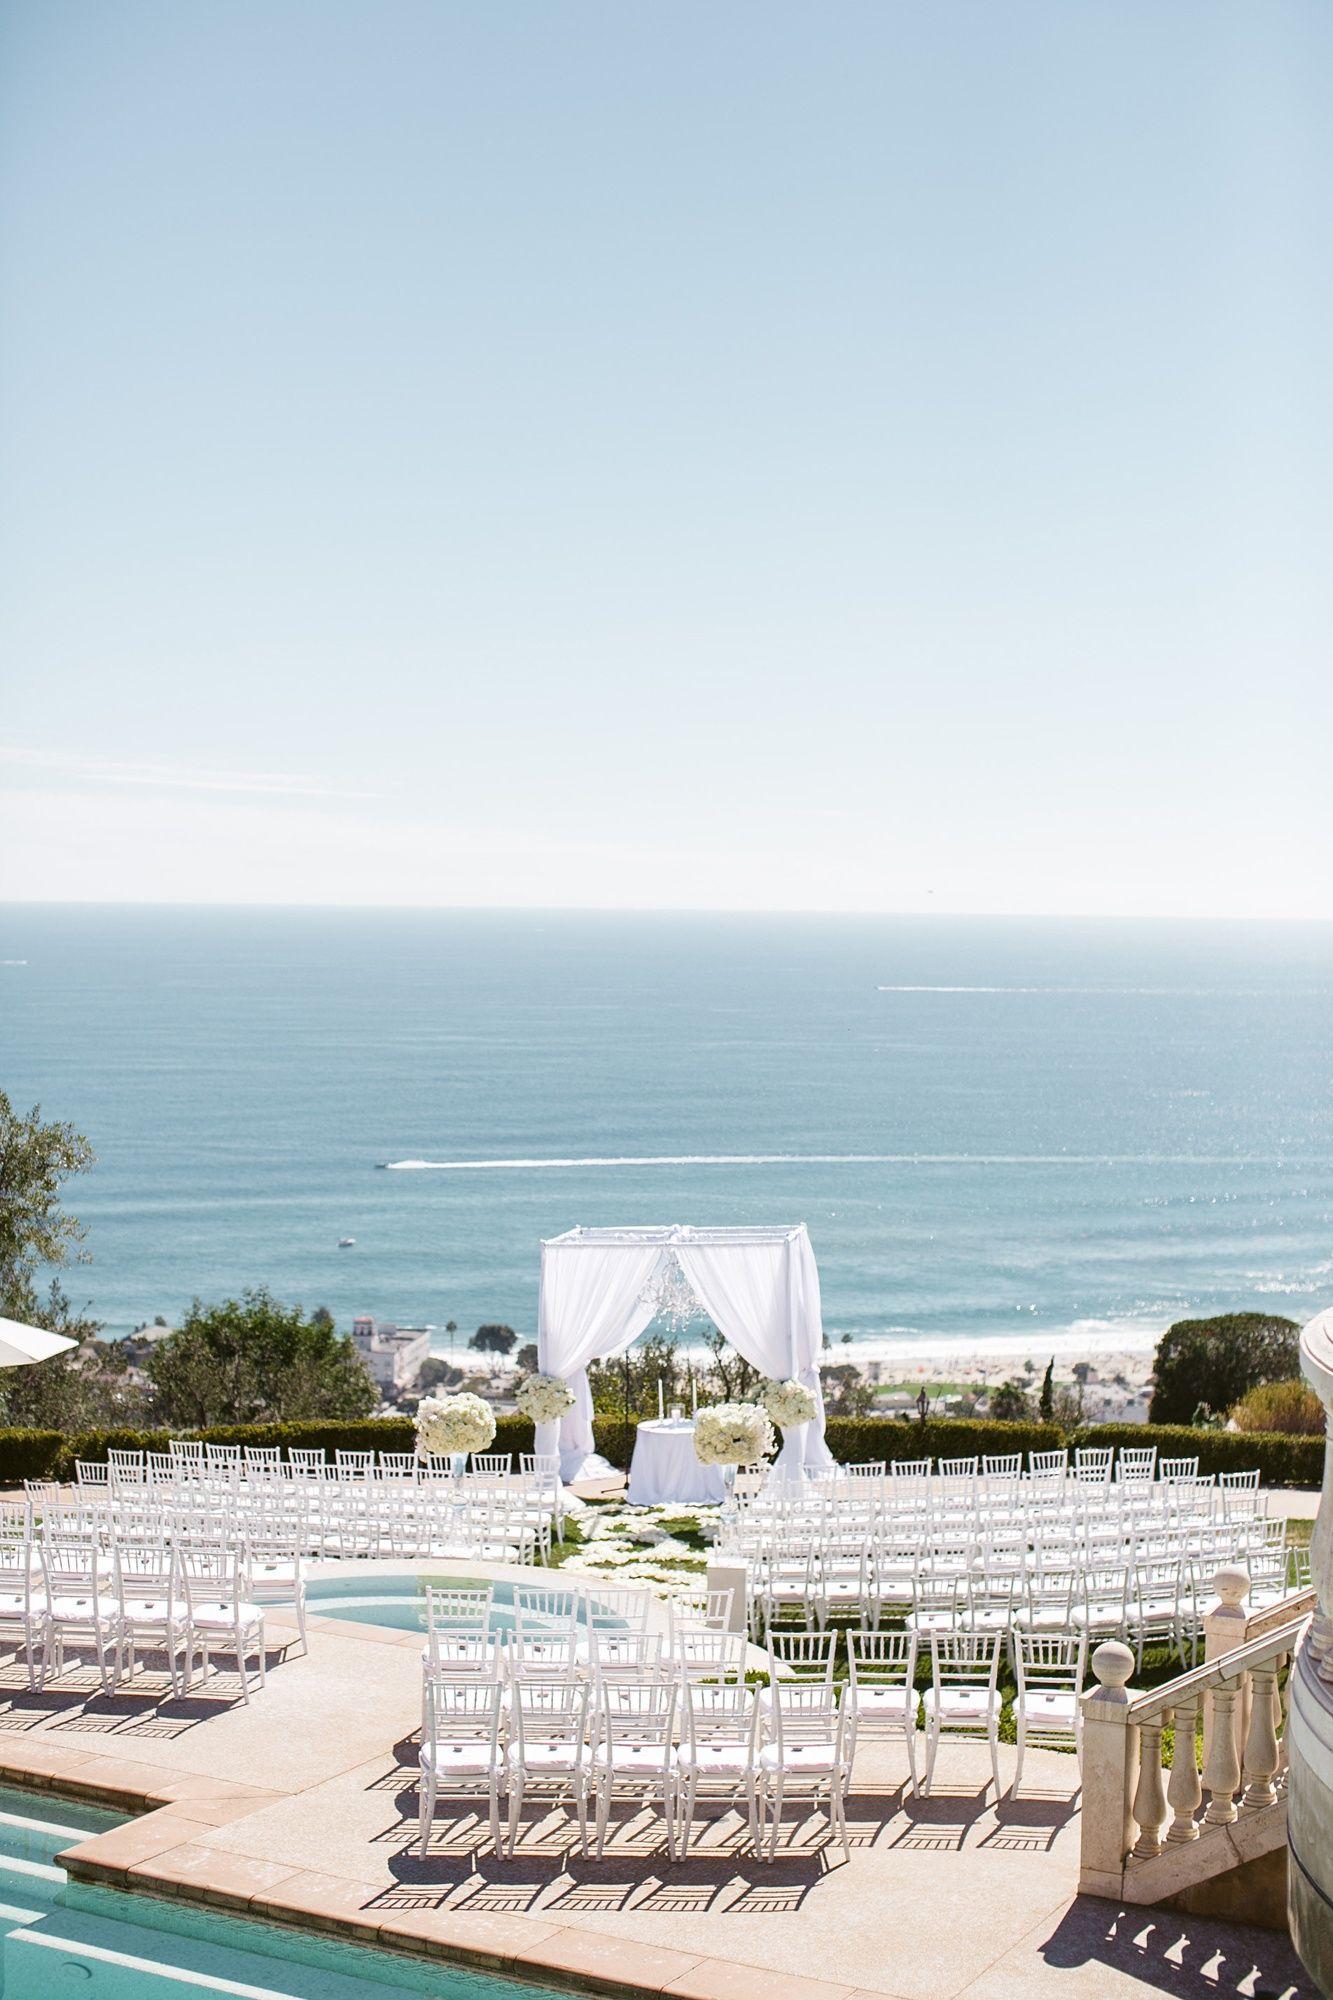 backyard wedding venues in orange county ca%0A An Elegant Seaside Wedding at Oceana Estate in Laguna Beach  California    Luxury Estate Weddings